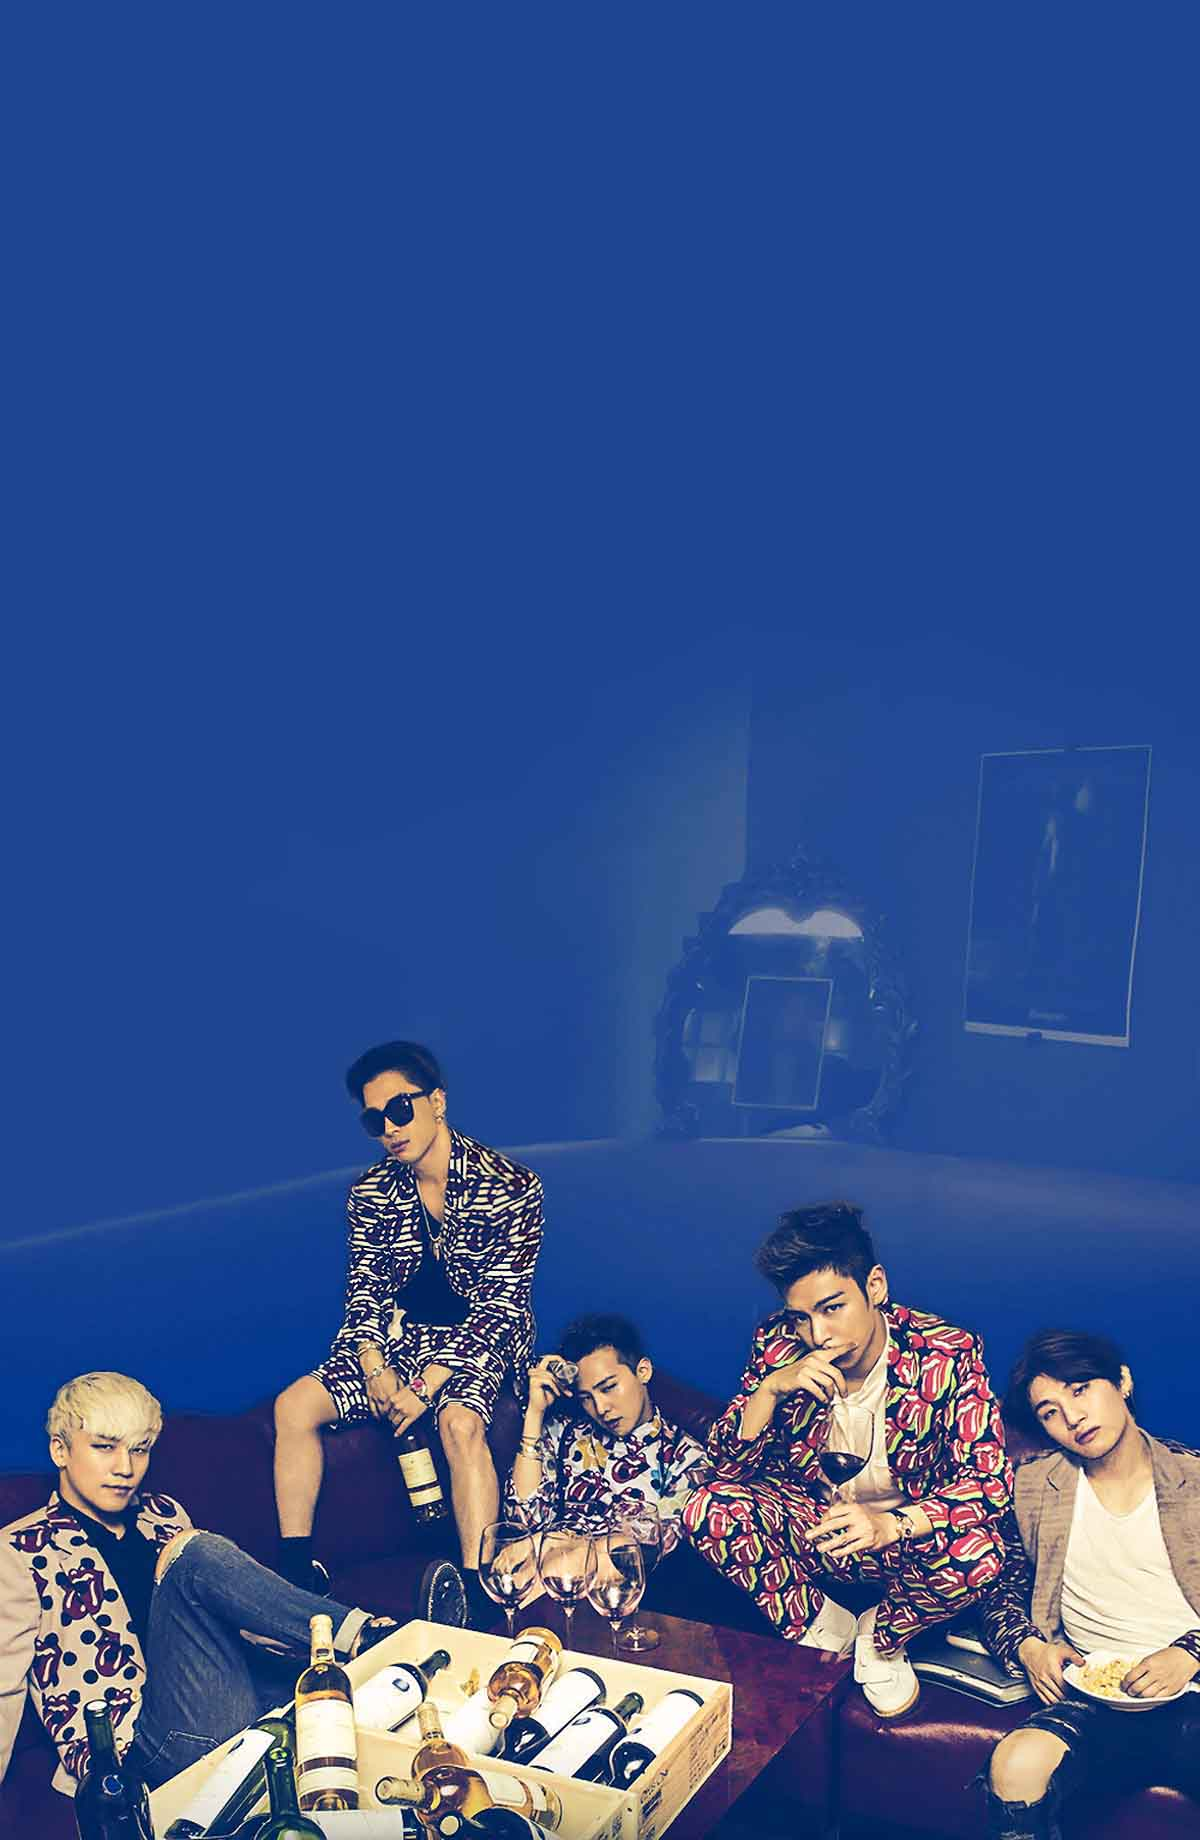 Bigbang Concert Wallpaper